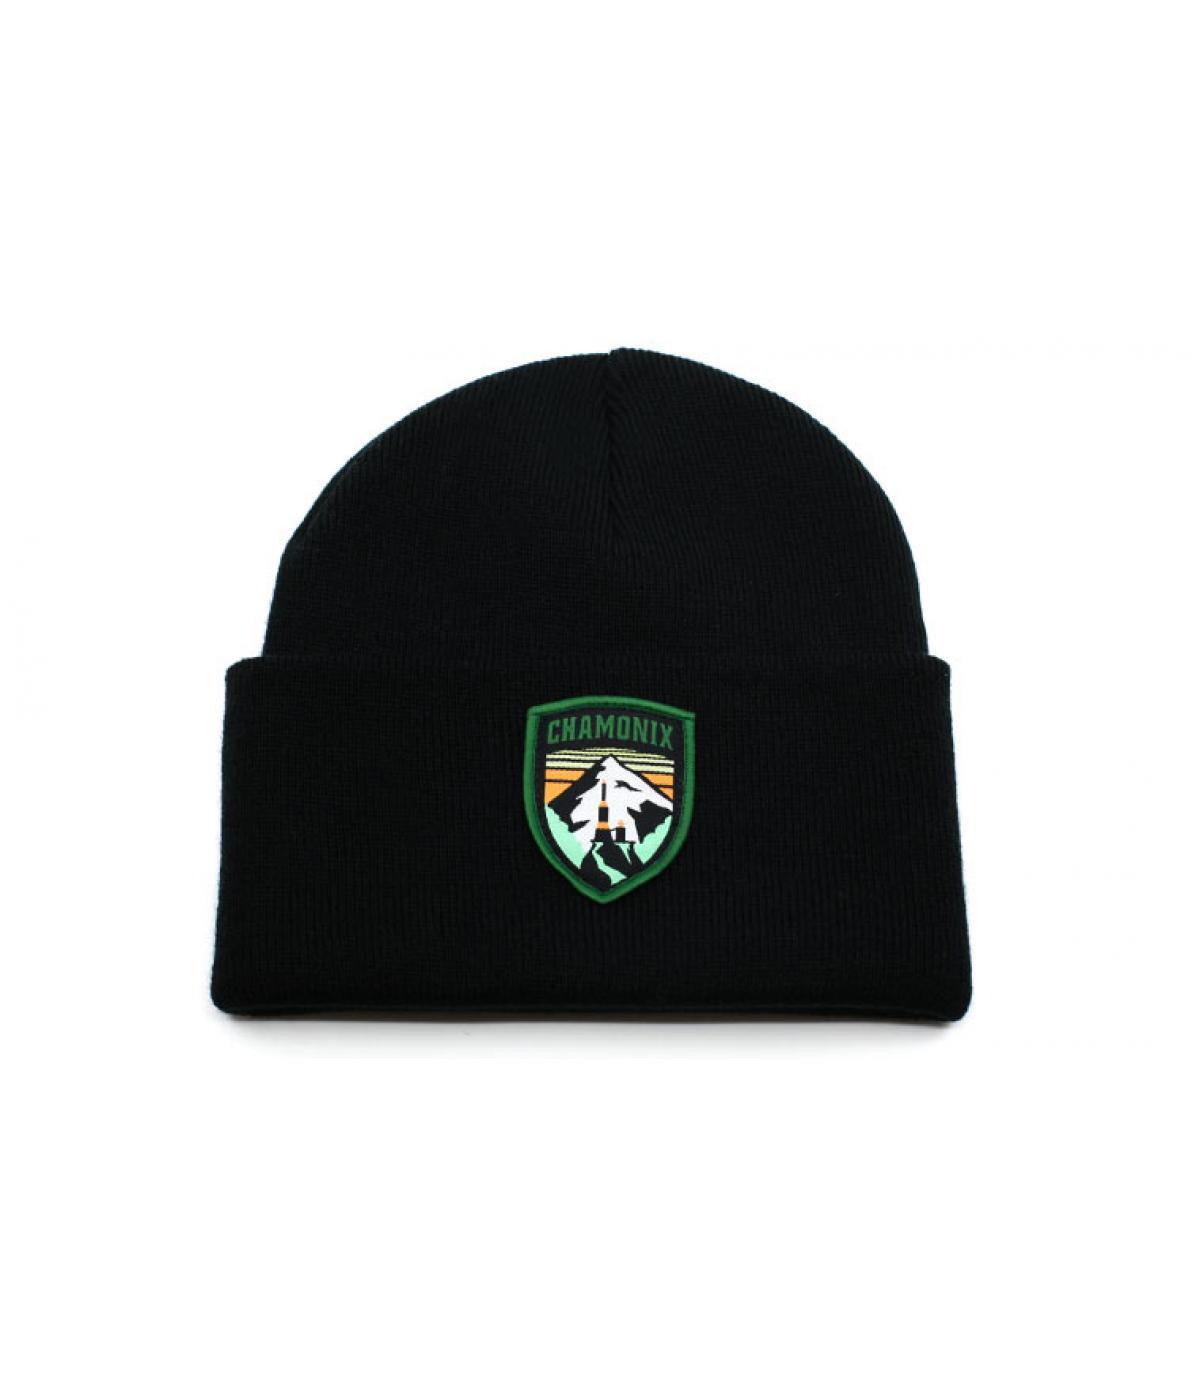 bonnet Chamonix noir